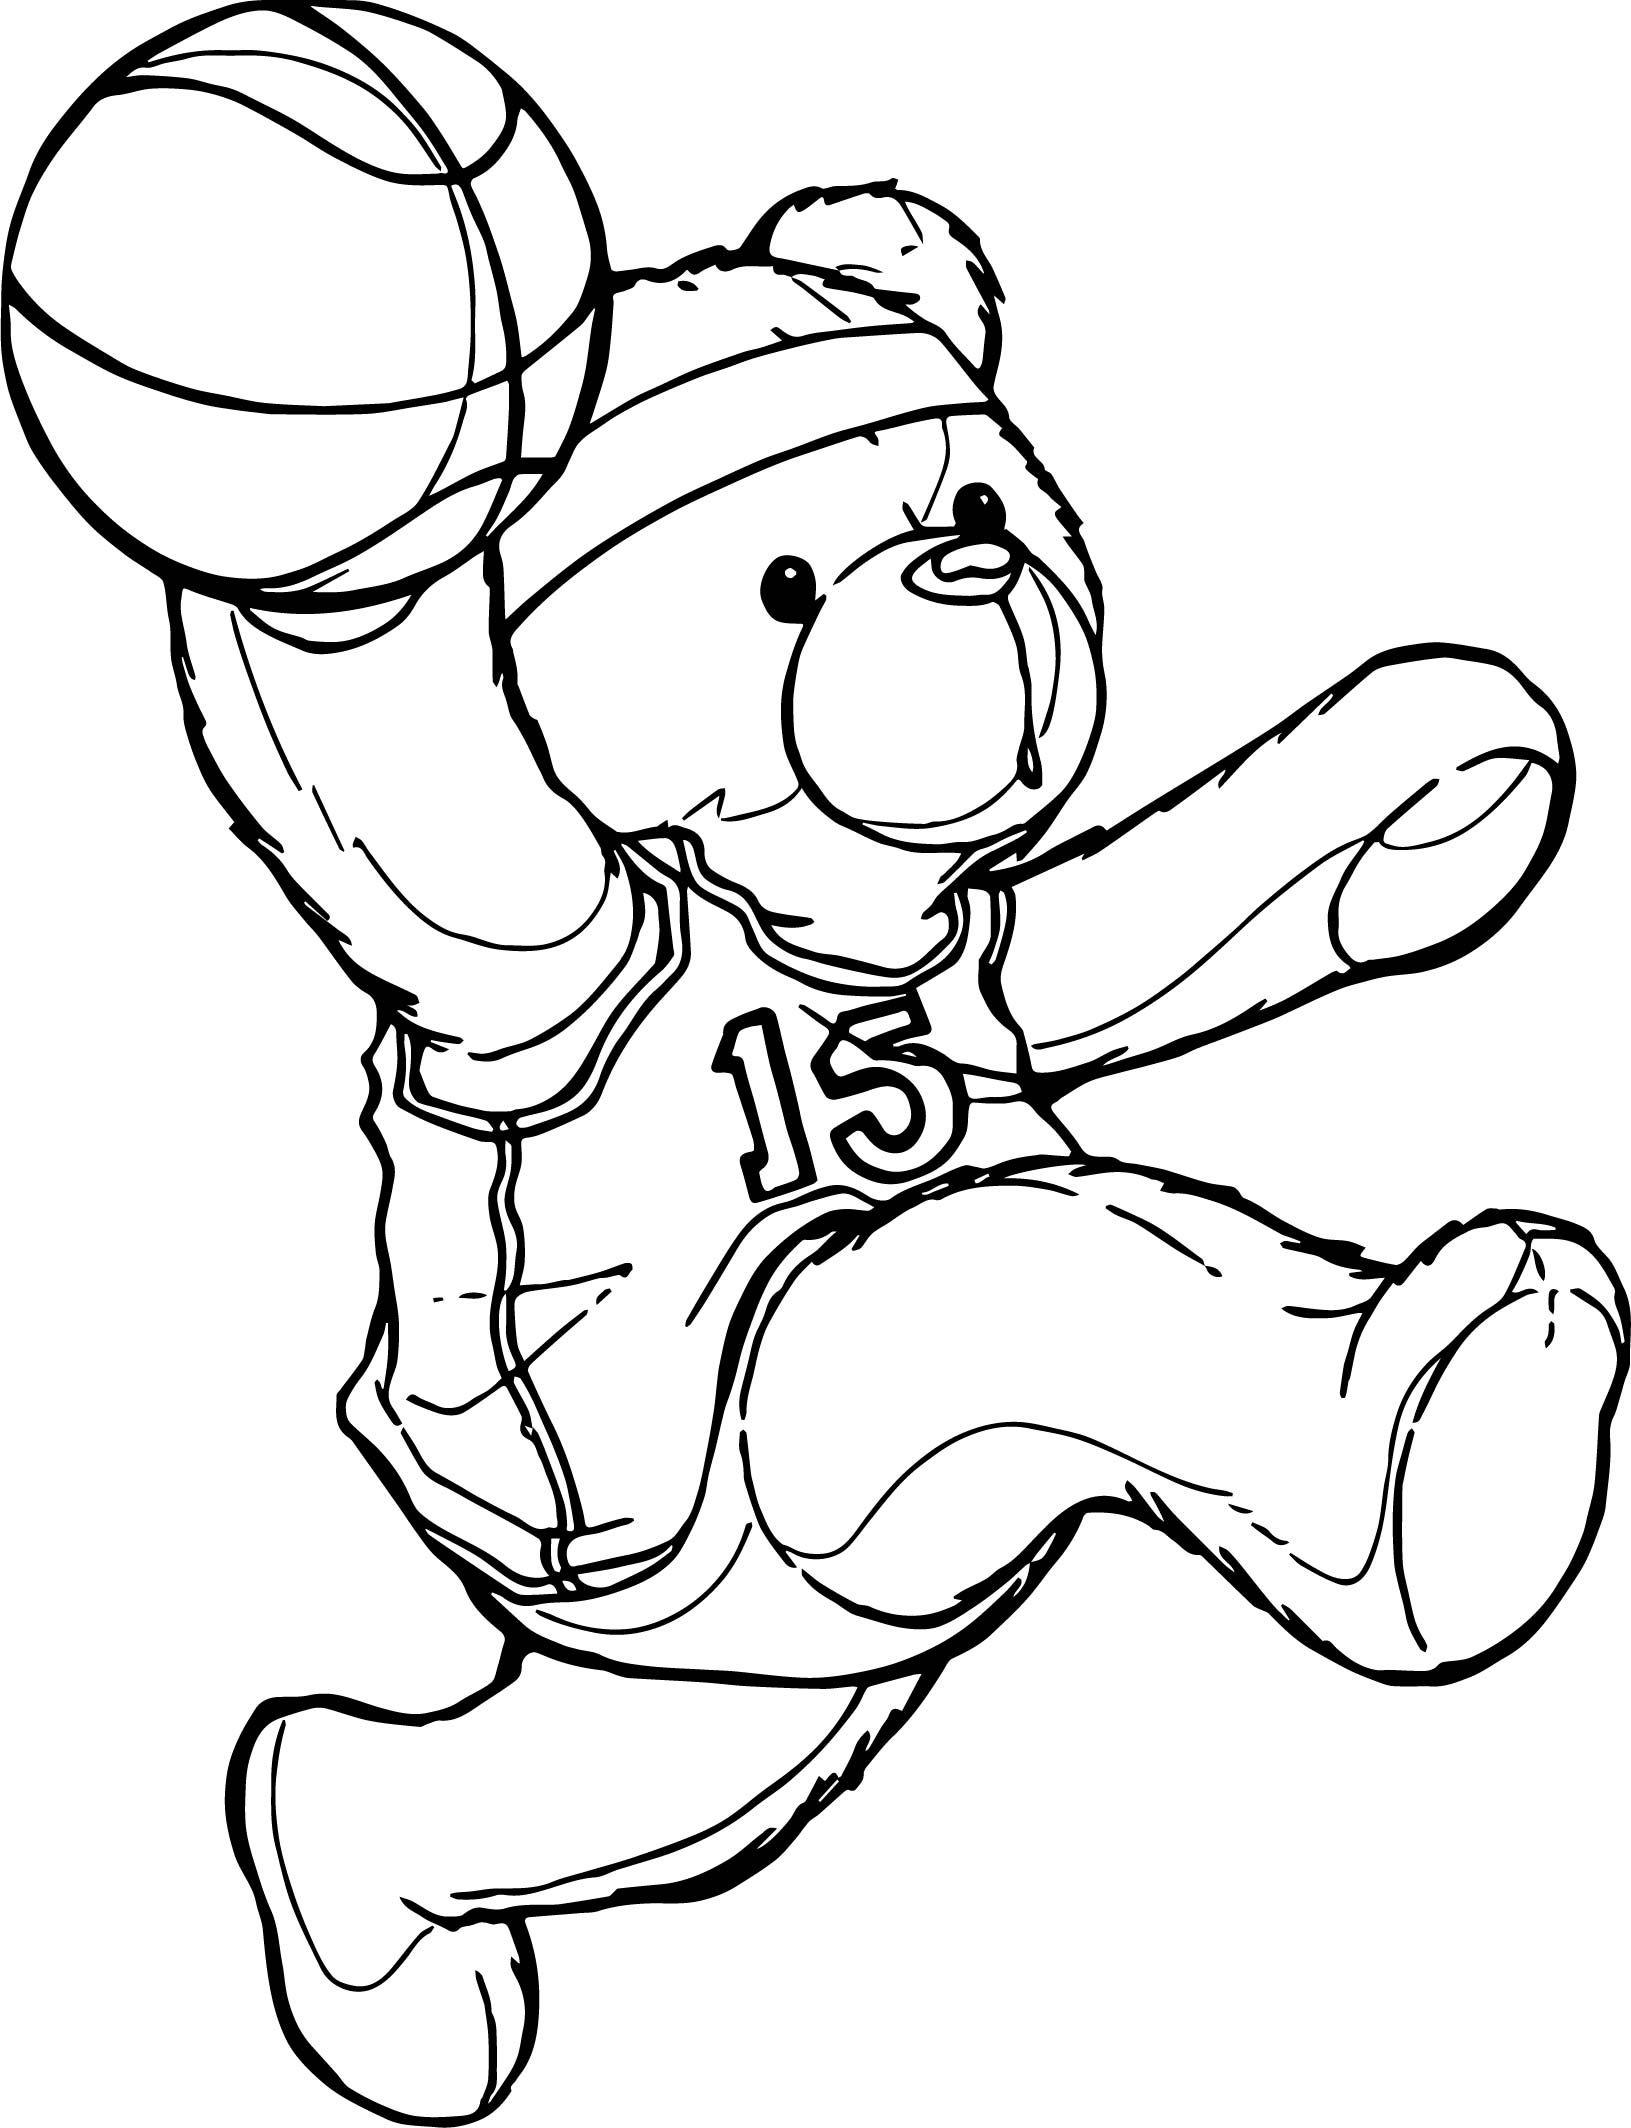 awesome Bear Playing Basketball Coloring Page | Baseball ...